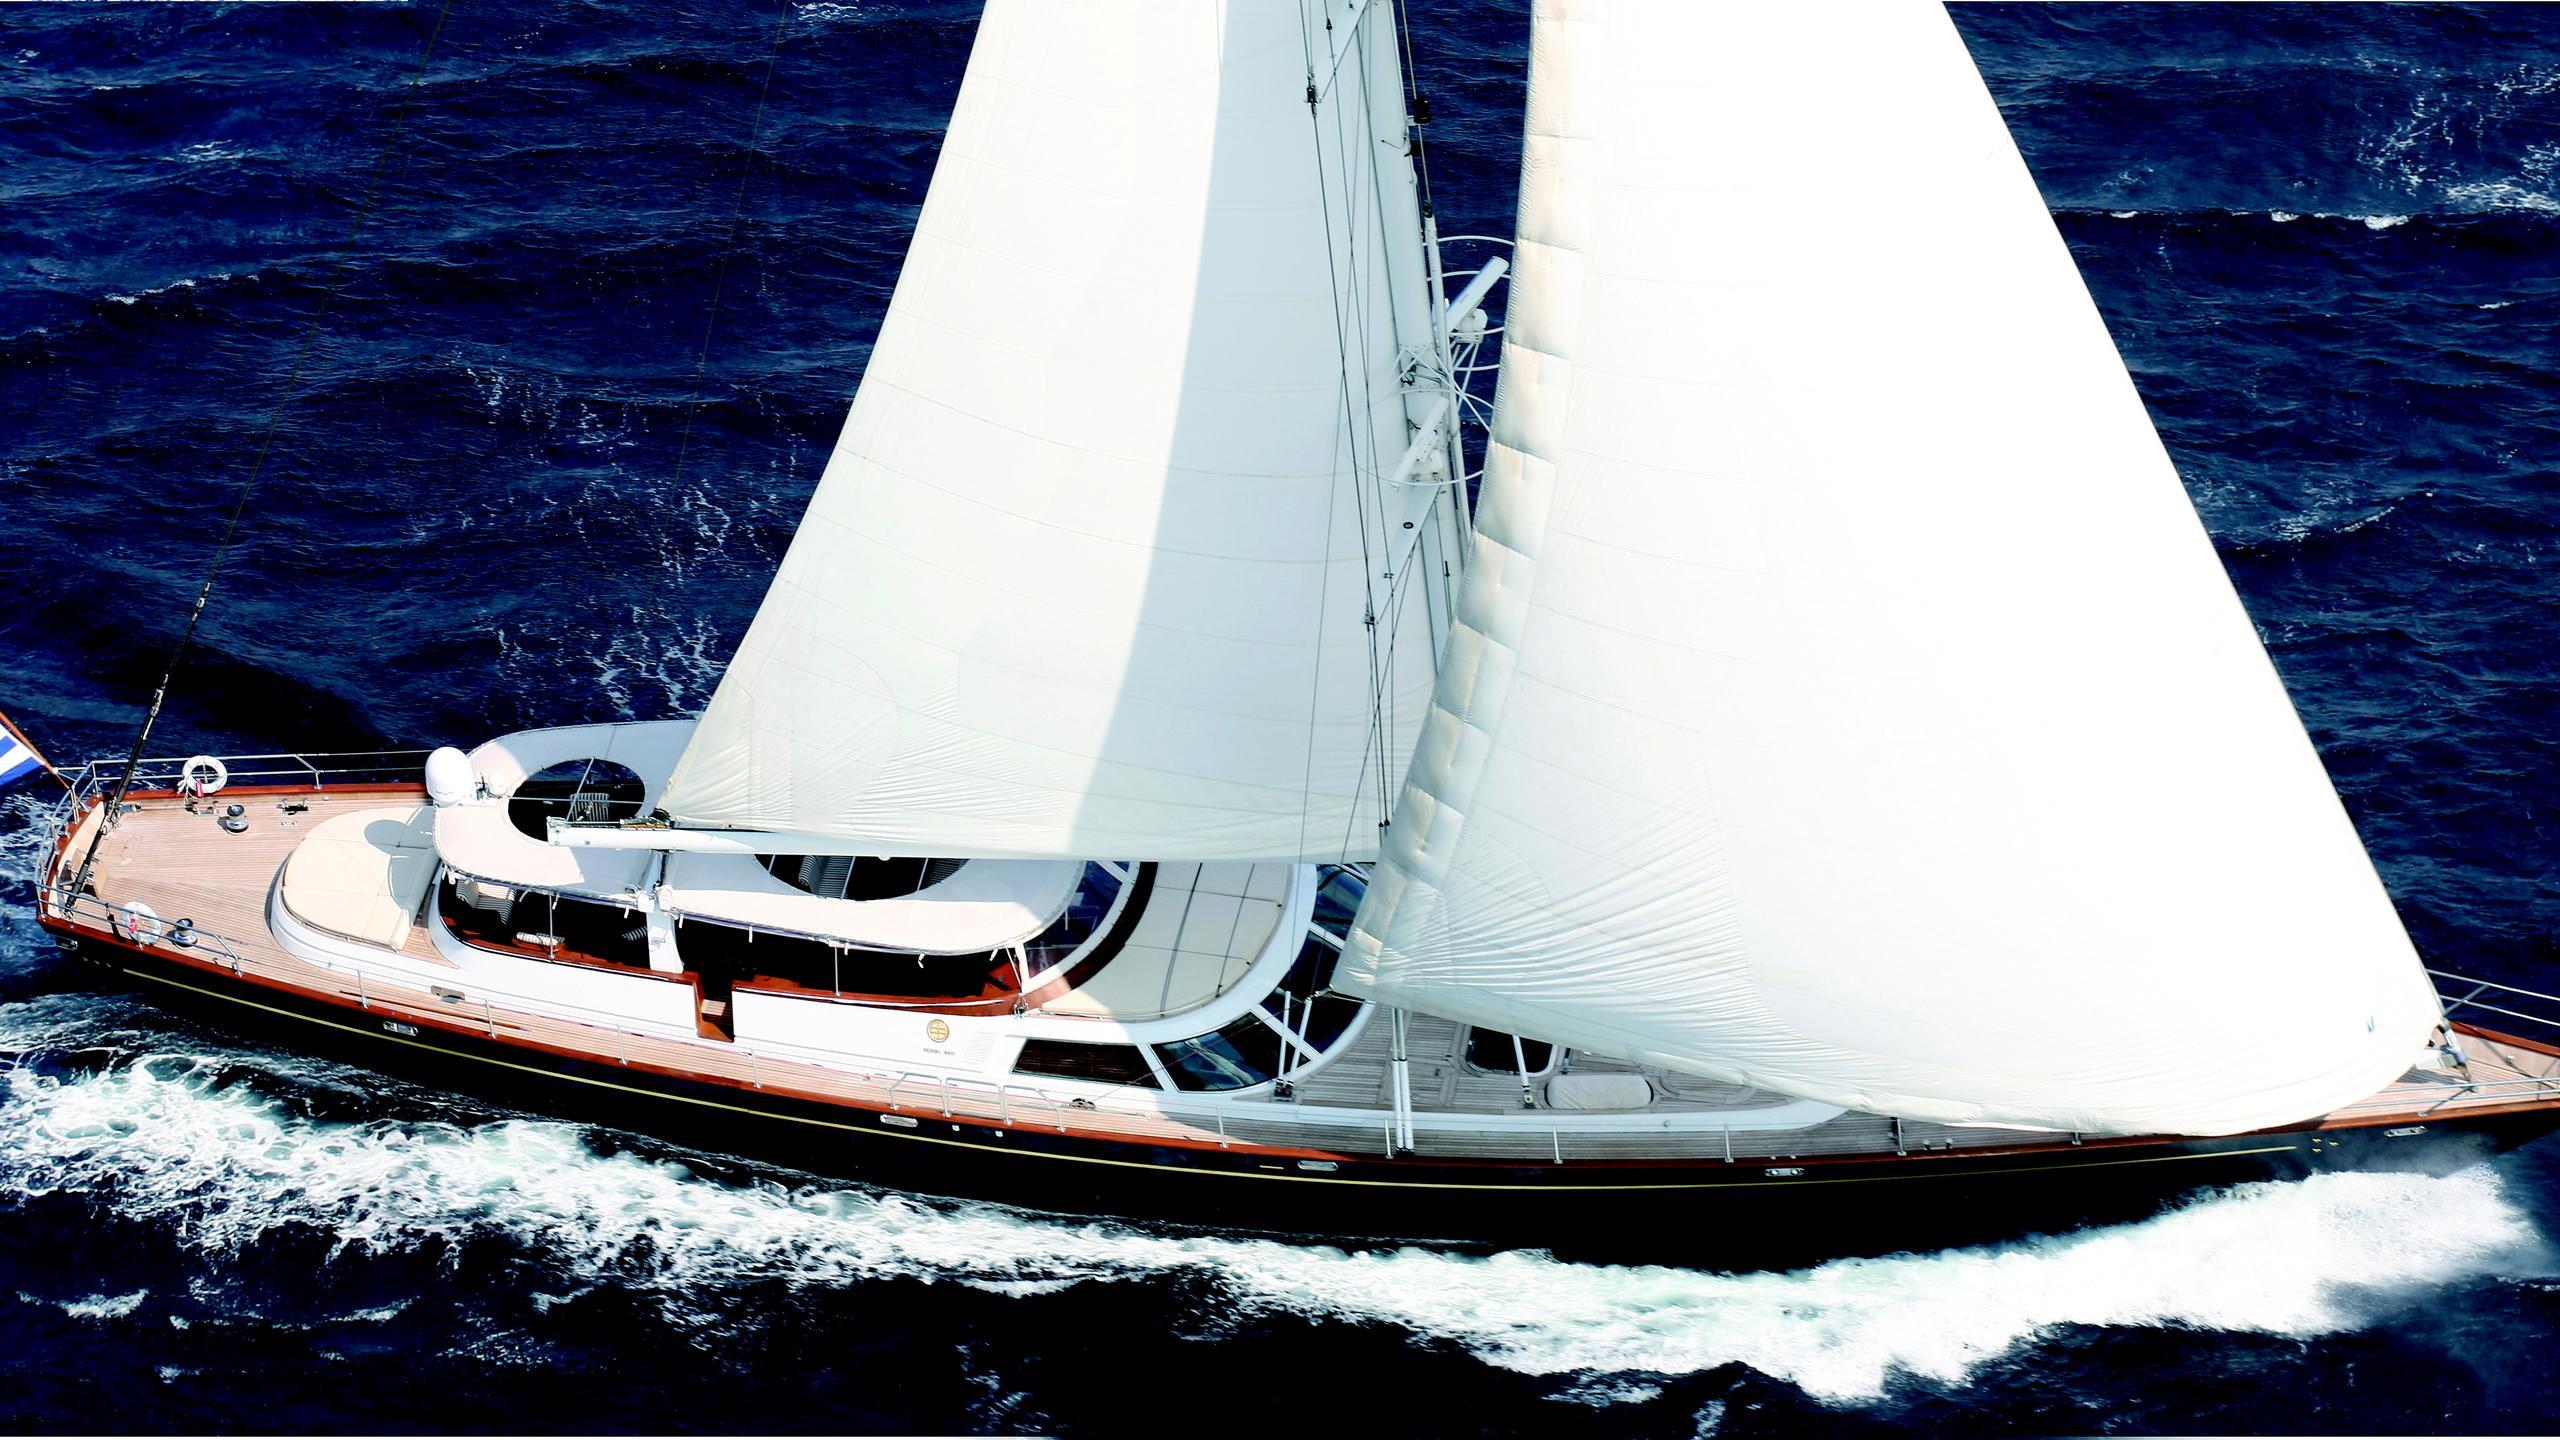 gitana-yacht-at-sea